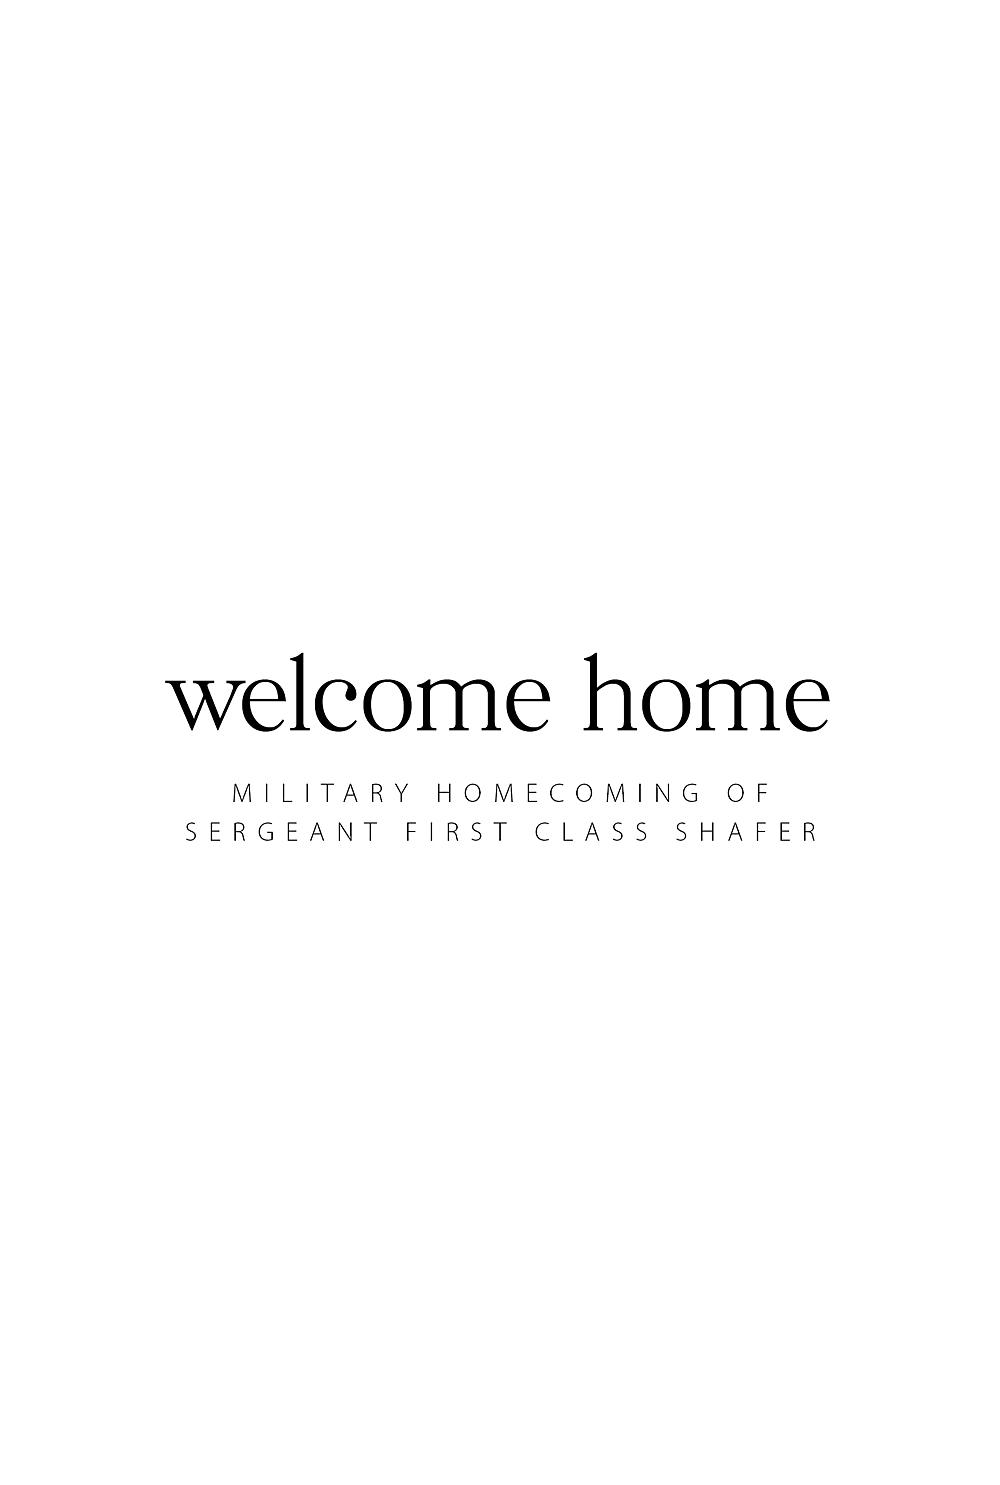 Welcome home_0027.jpg